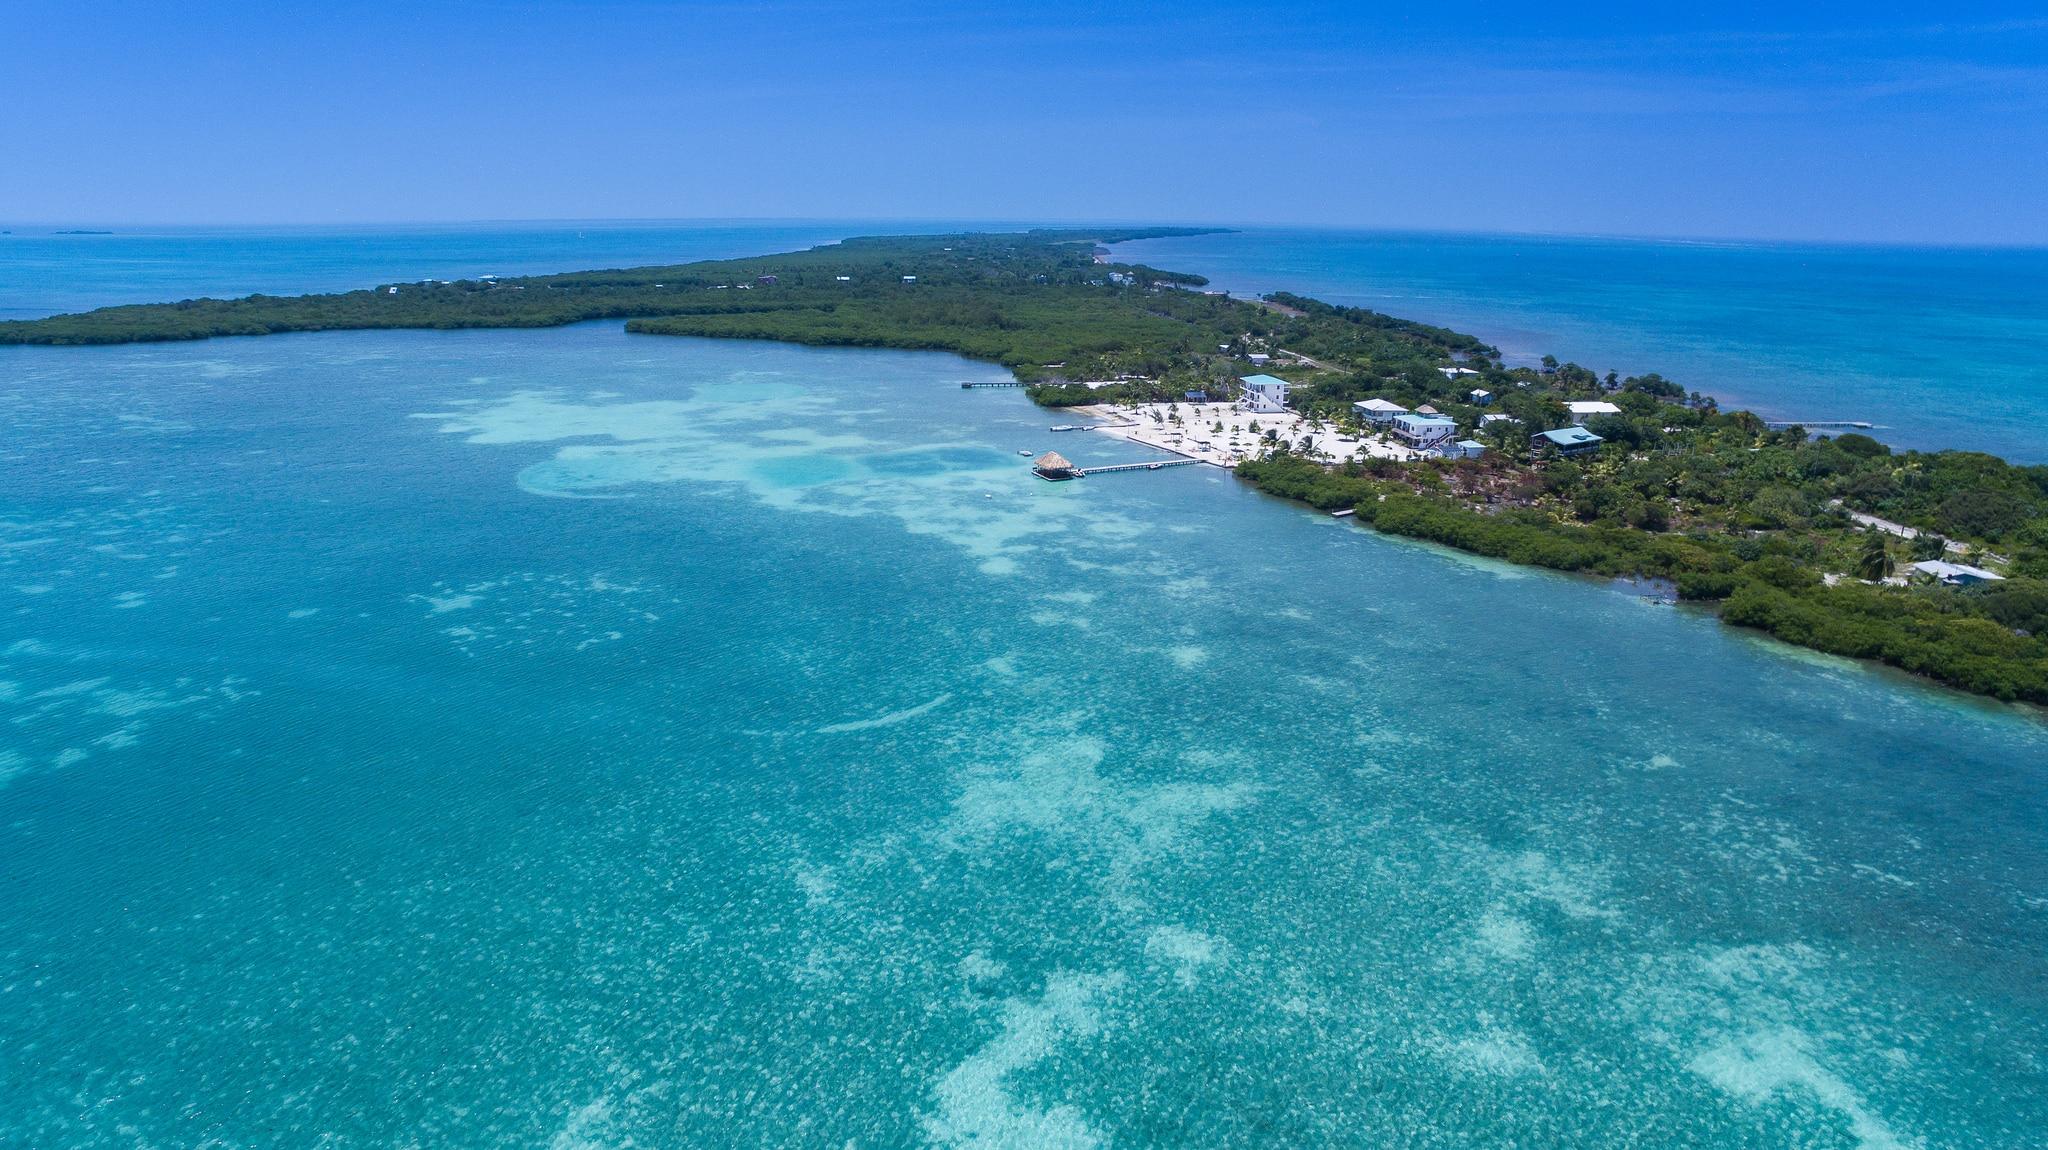 Caye Caulker Belize Barrier Reef by Falco Ermert